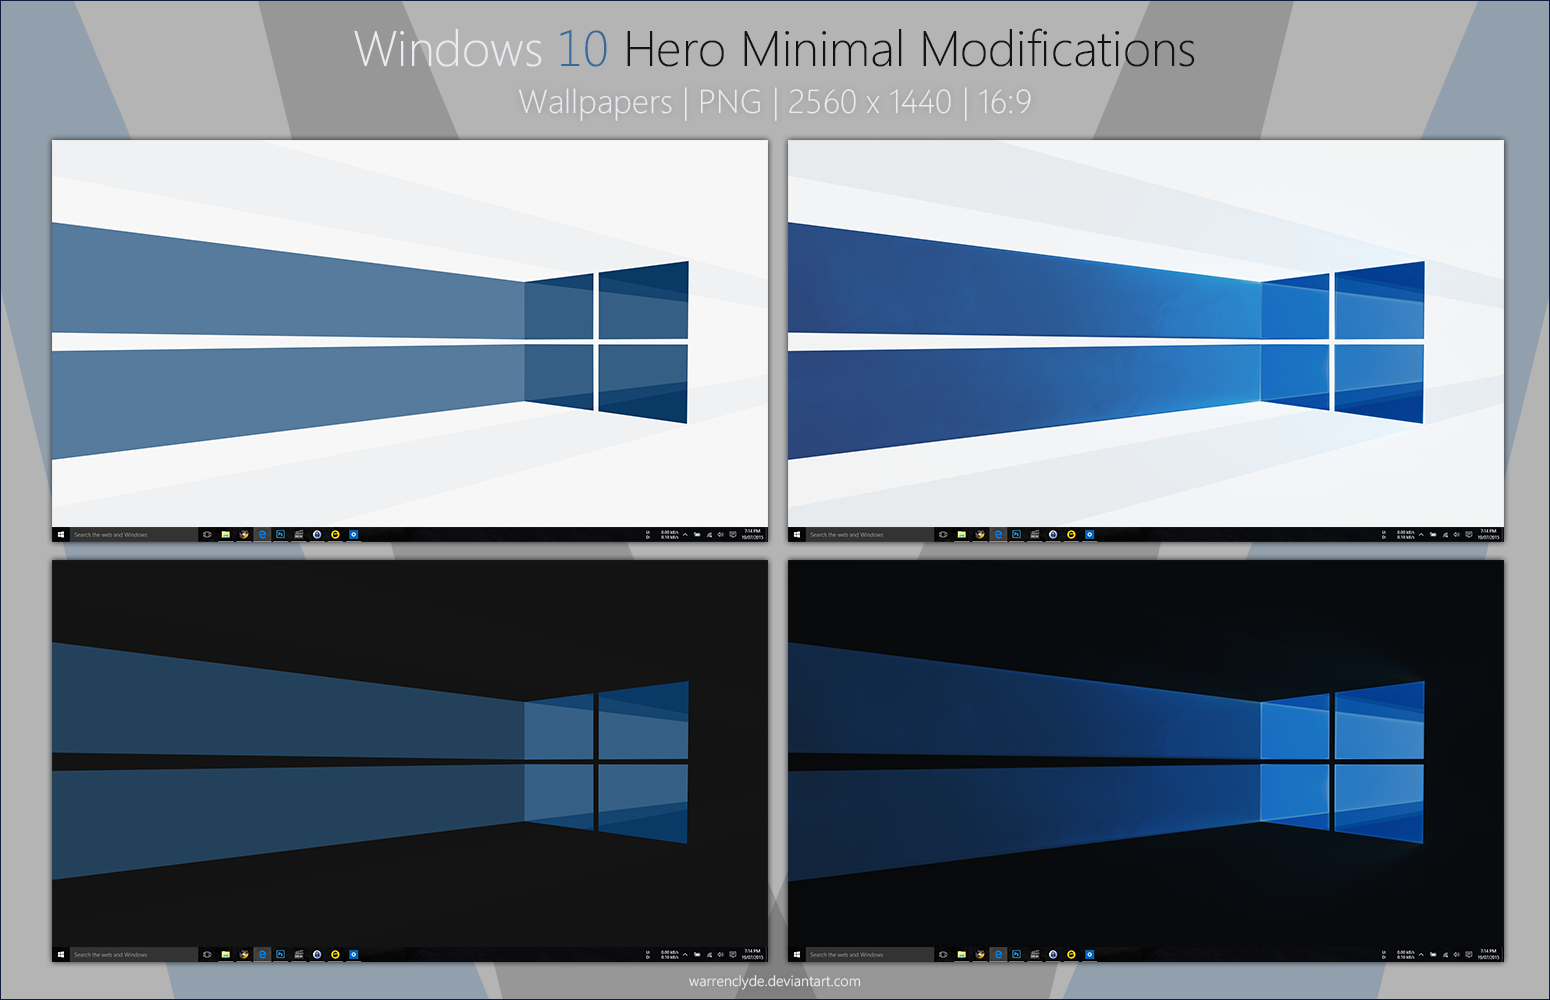 Windows 10 Hero Minimal Wallpapers By Warrenclyde On Deviantart